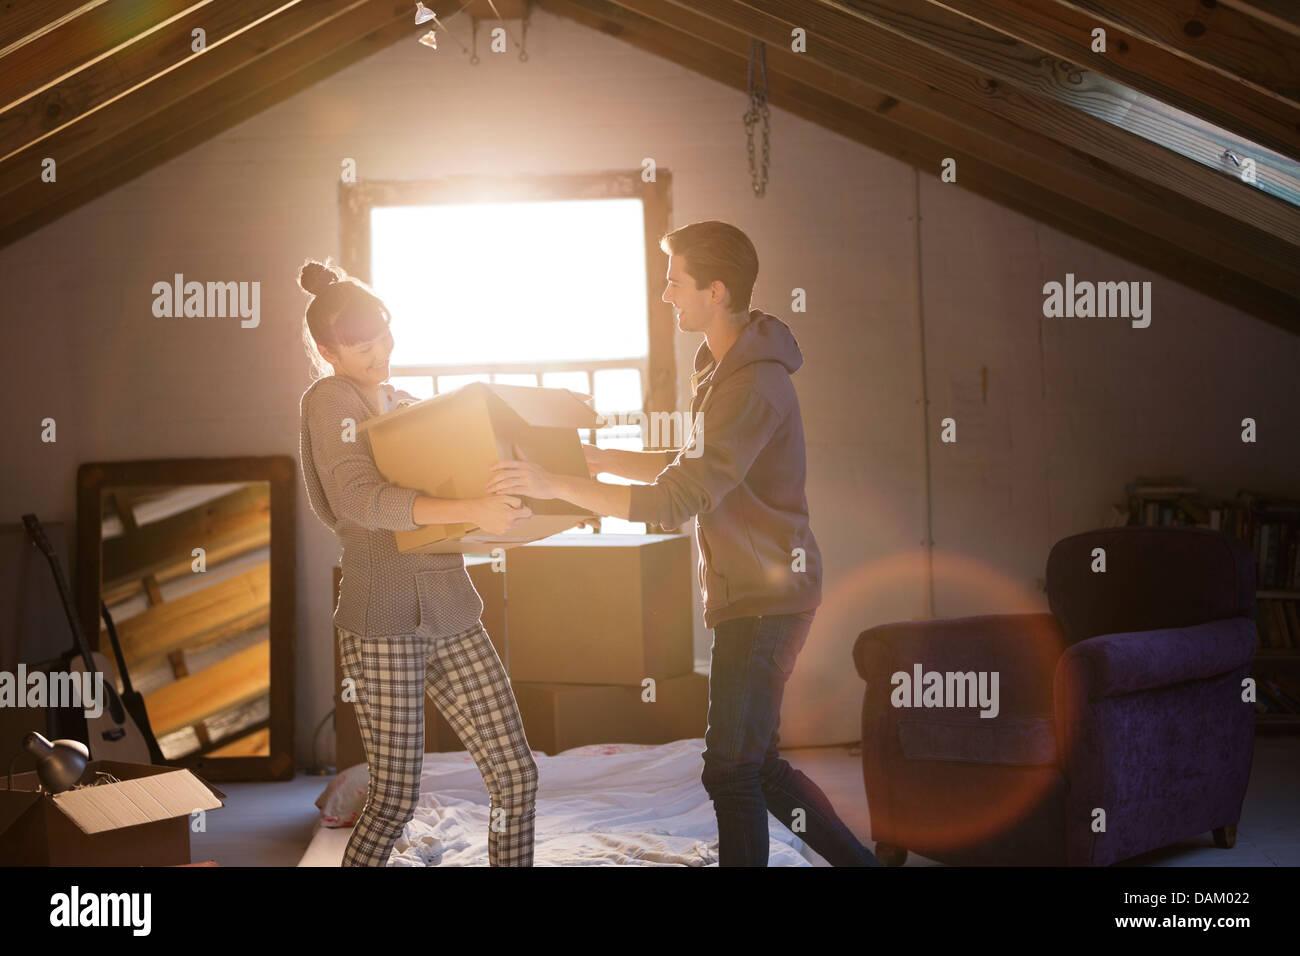 Couple unpacking box in attic - Stock Image